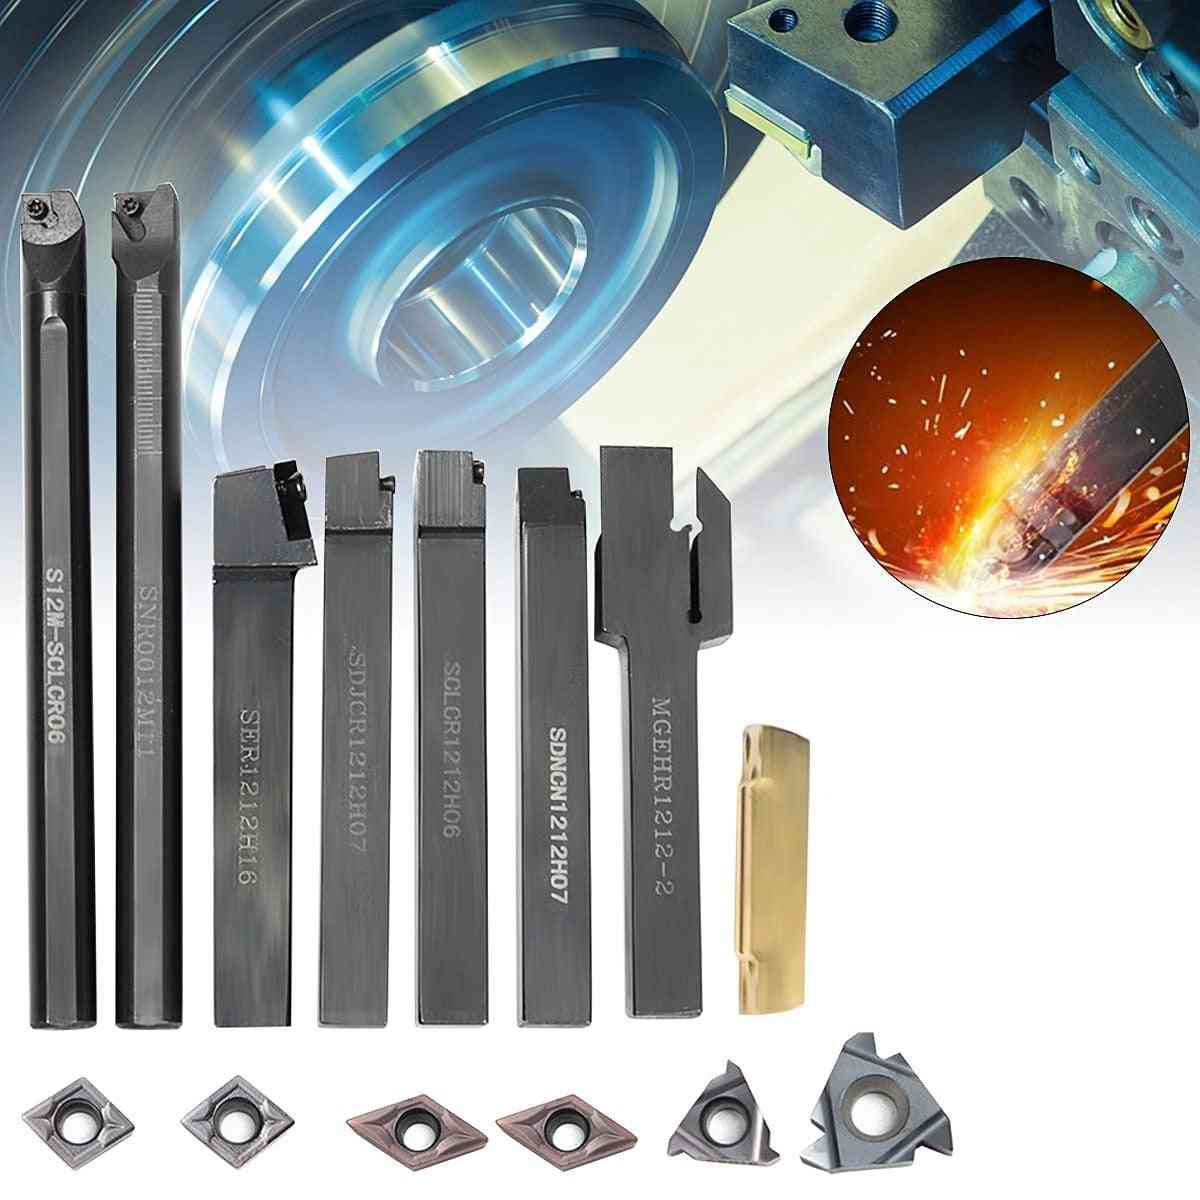 7pcs Carbide Insert, Lathe Turning Tool Holder Boring Bar, Wrench